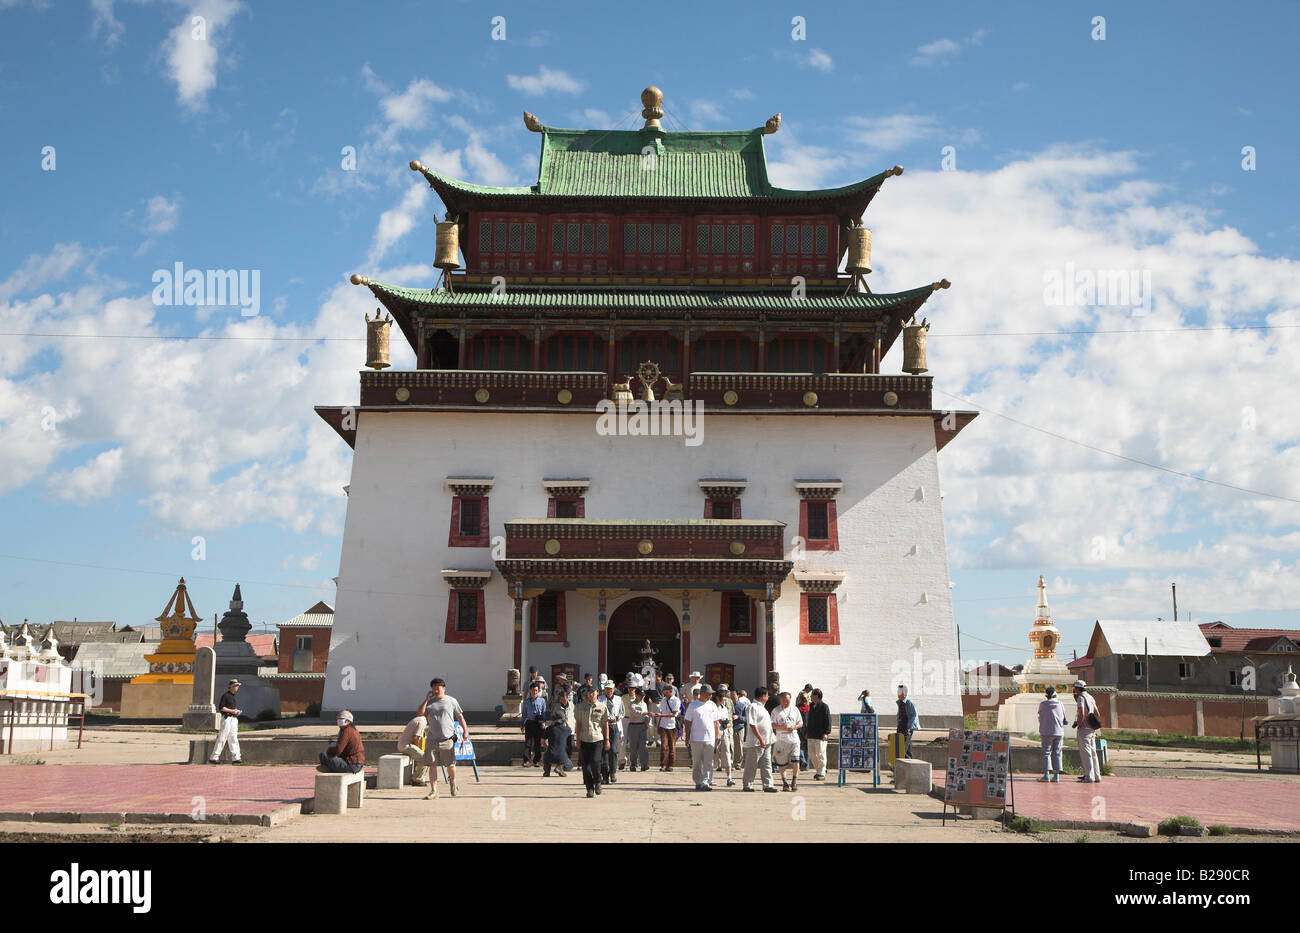 Gandantegchinlen Khiid Monastry in Ulaan Baatar Mongolia - Stock Image